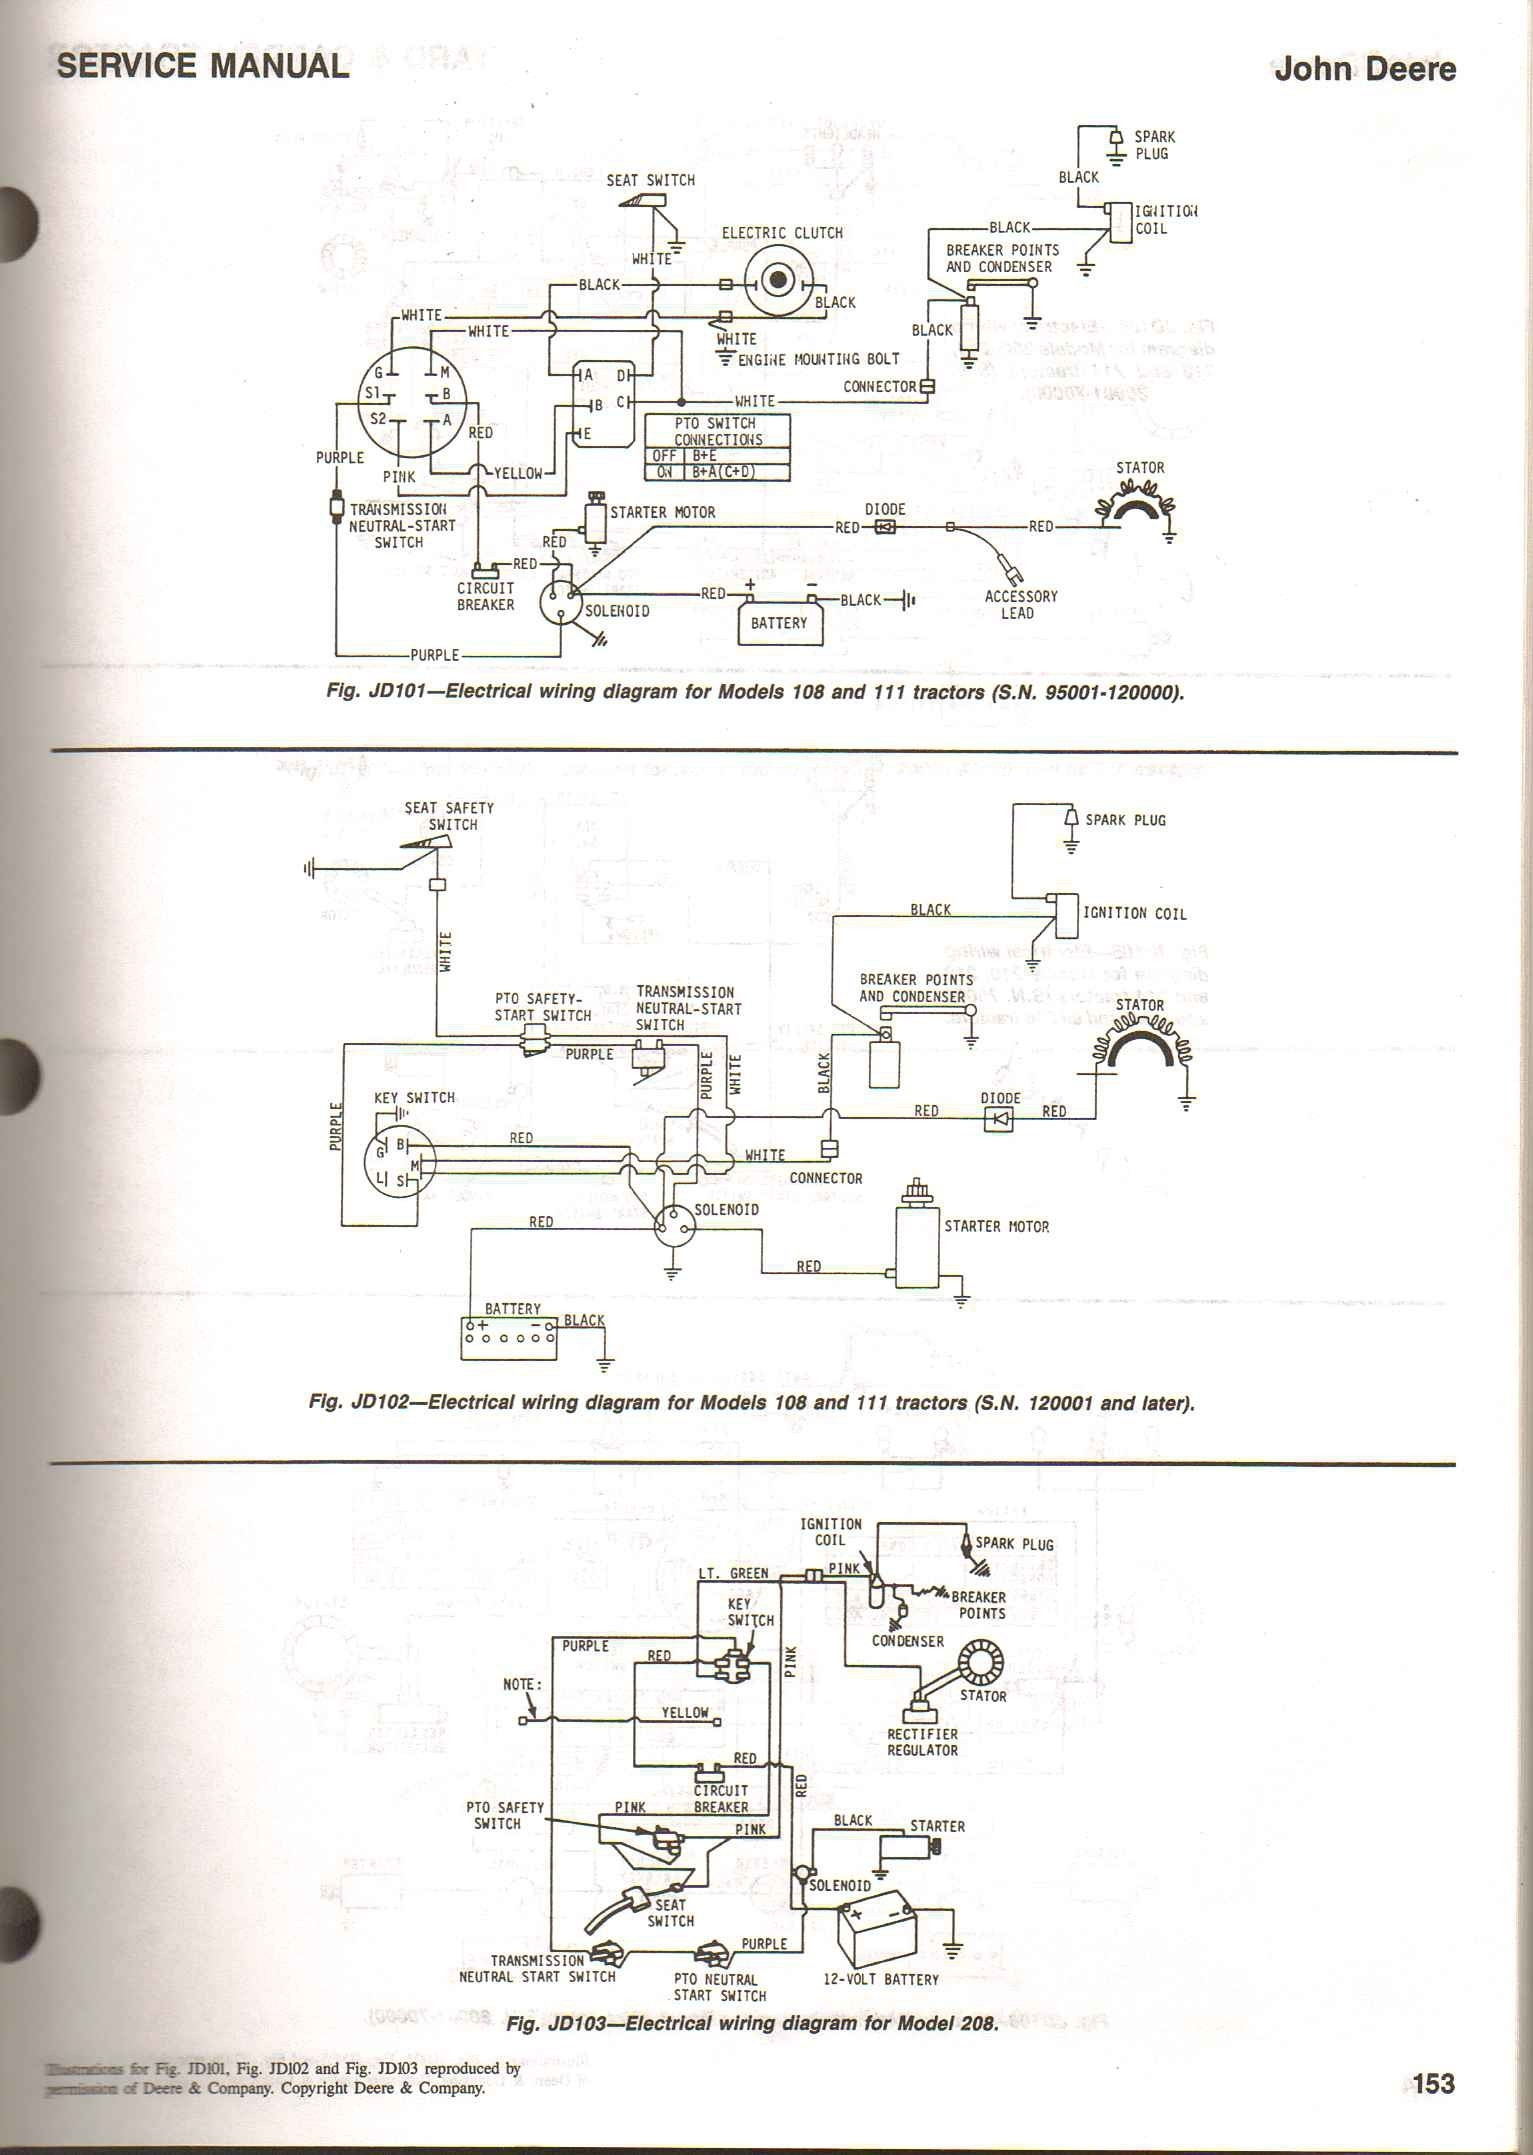 john deere gator 6x4 wiring diagram best wiring library deere gator wiring-diagram gator 6x4 wiring diagram wiring diagramsjohn deere stx38 wiring schematic free wiring diagram tractor john deere